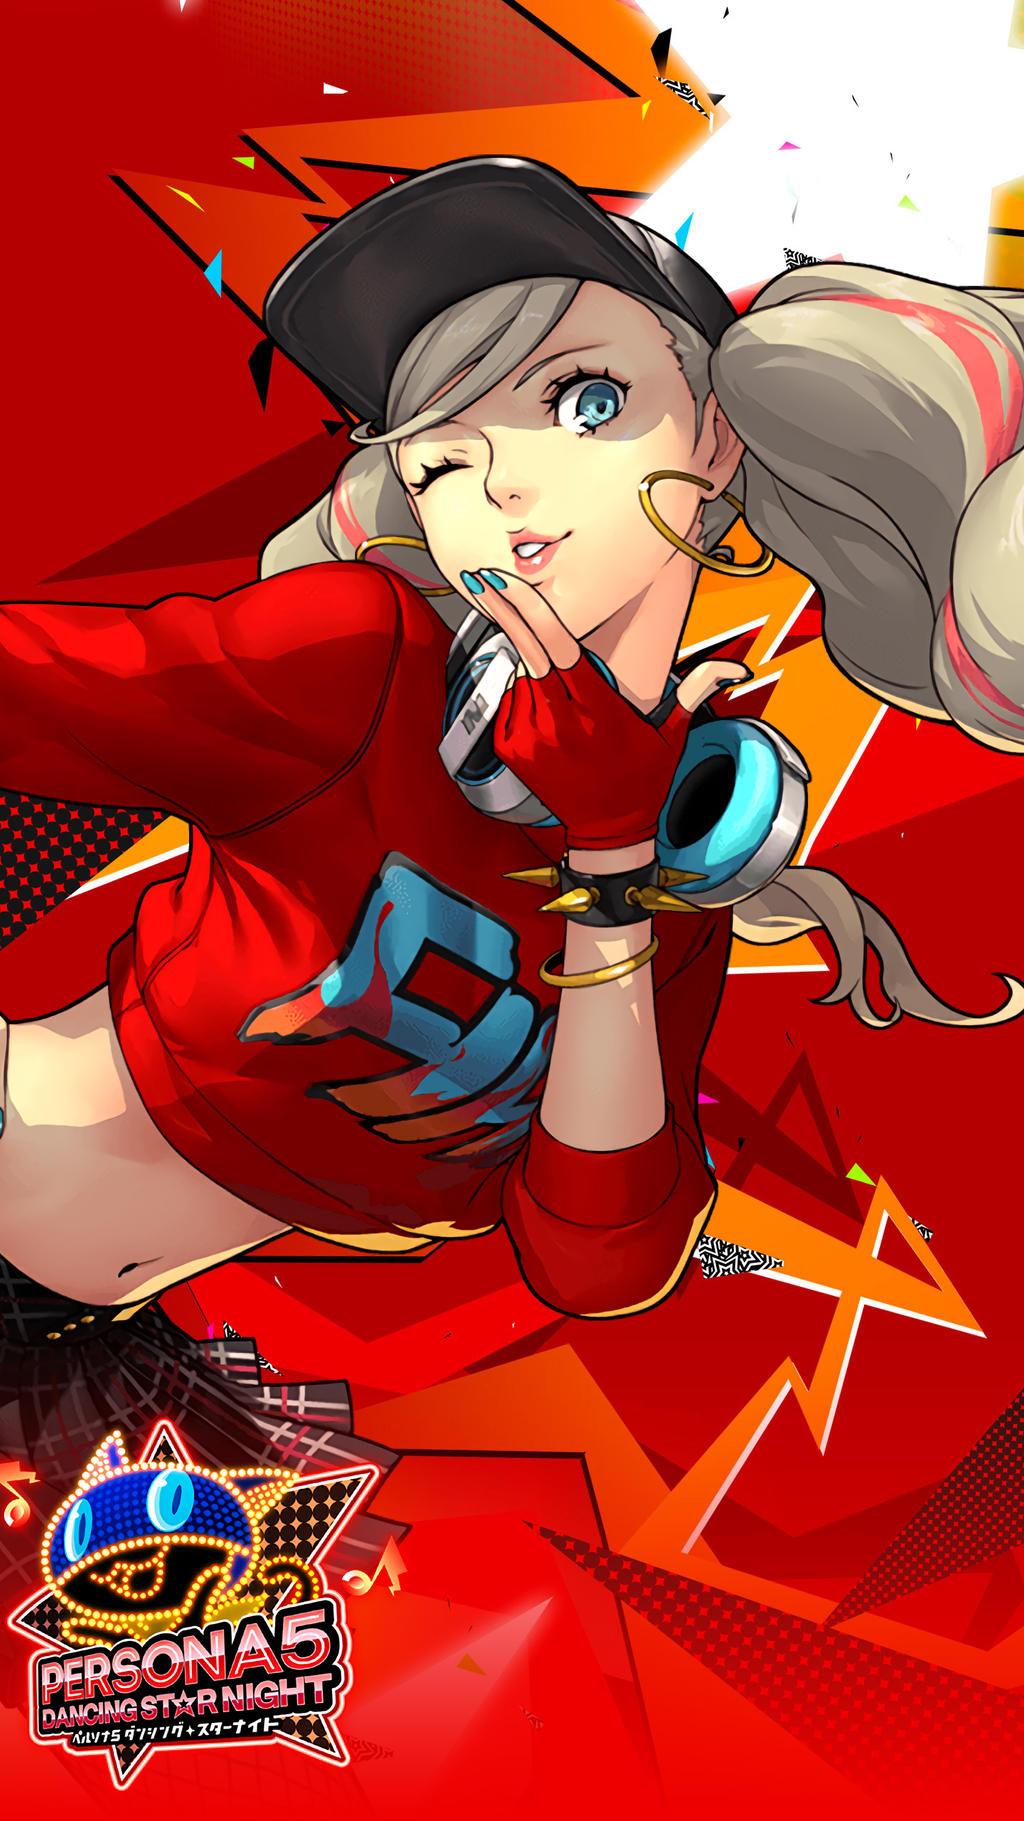 Persona 5 Dancing Star Night Ann Wallpaper By Farizf On Deviantart